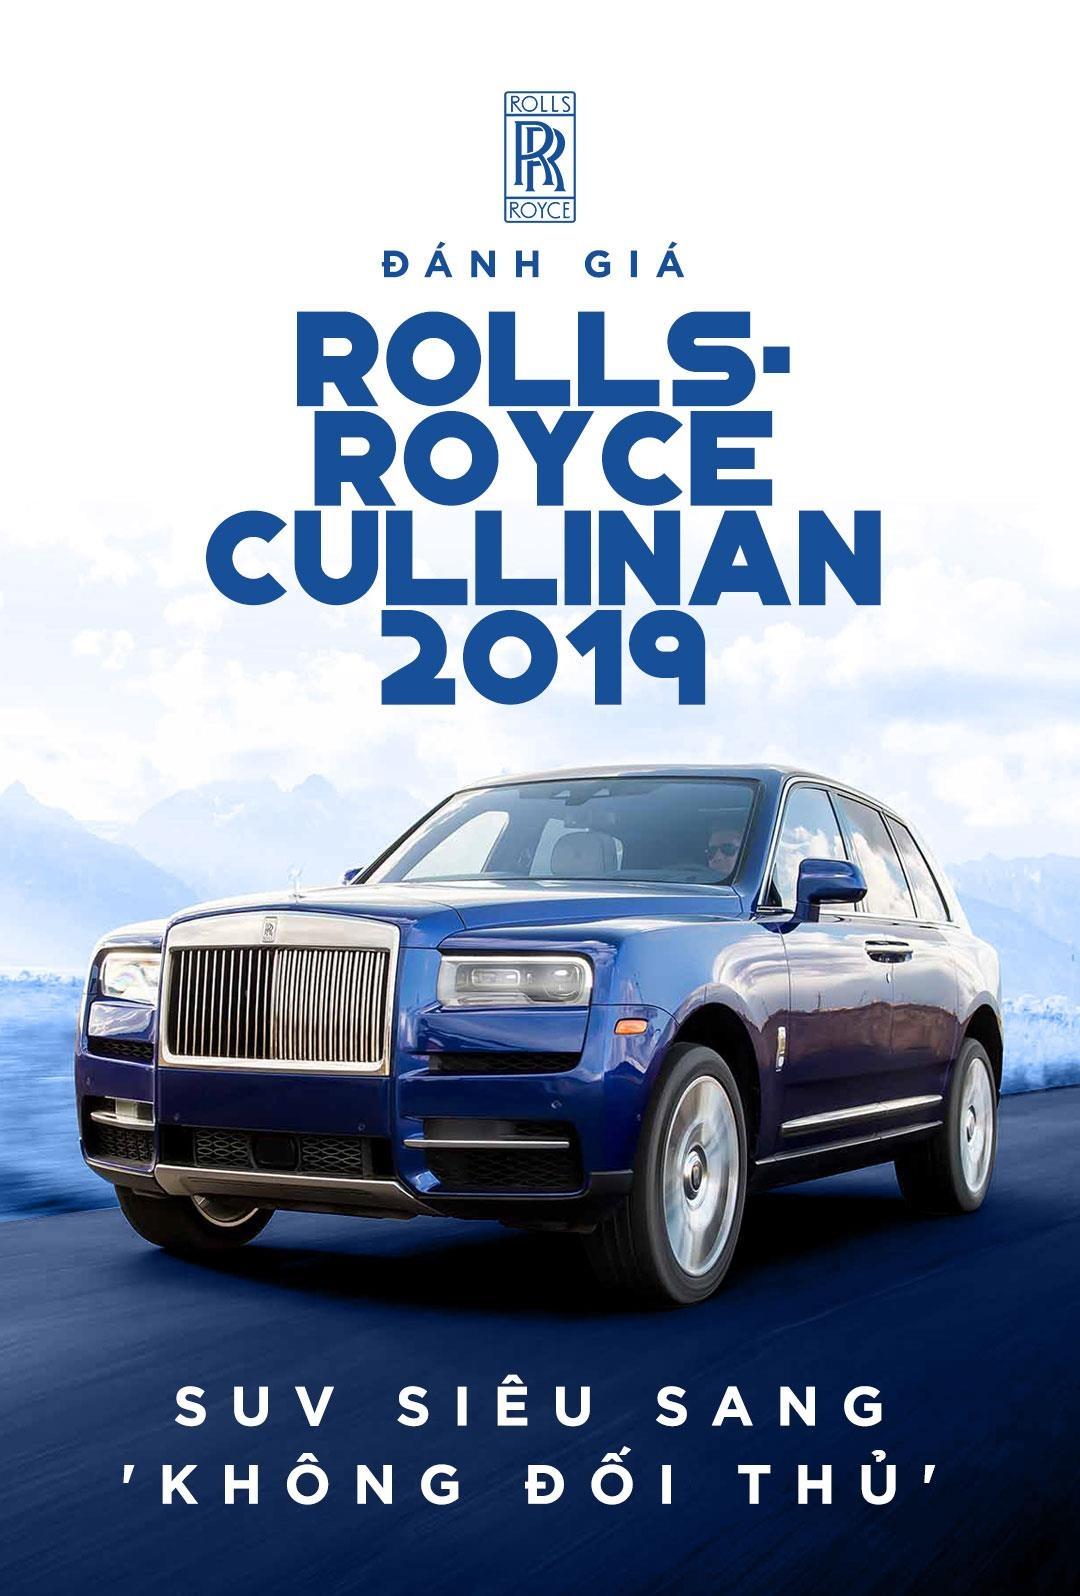 danh gia Rolls-Royce Cullinan anh 1